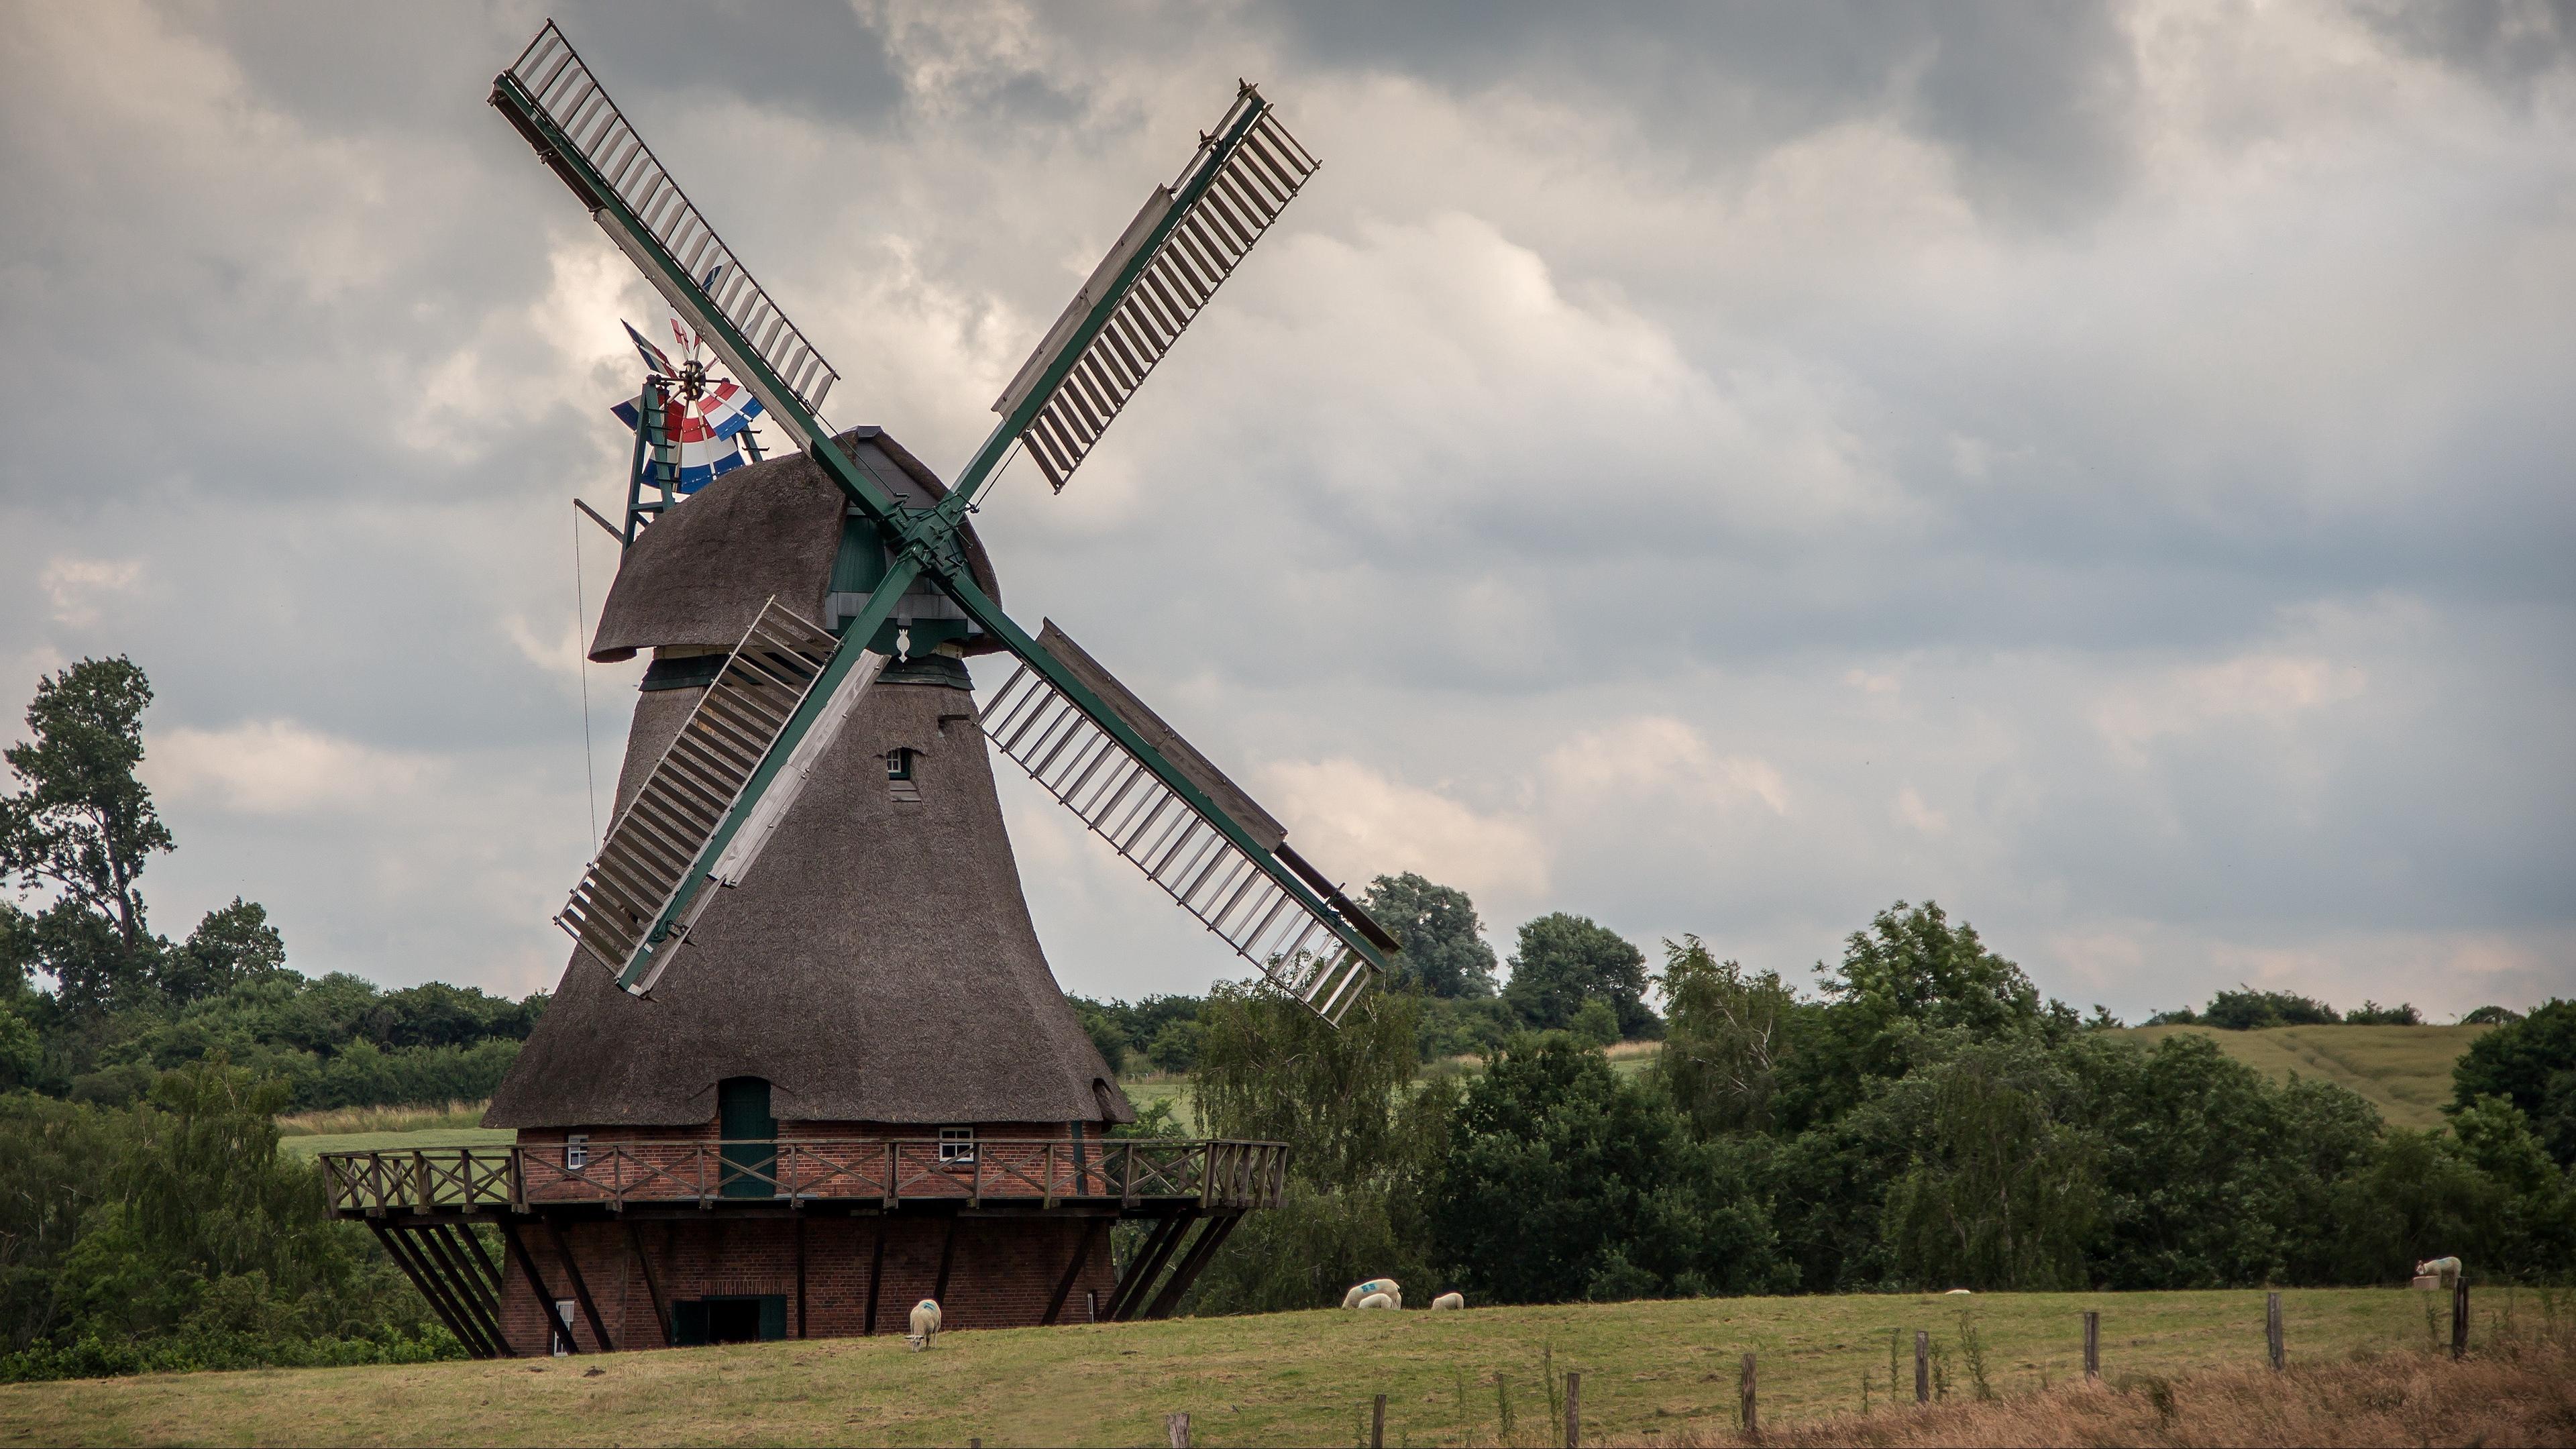 windmill agriculture sky 4k 1541116267 - windmill, agriculture, sky 4k - windmill, Sky, Agriculture